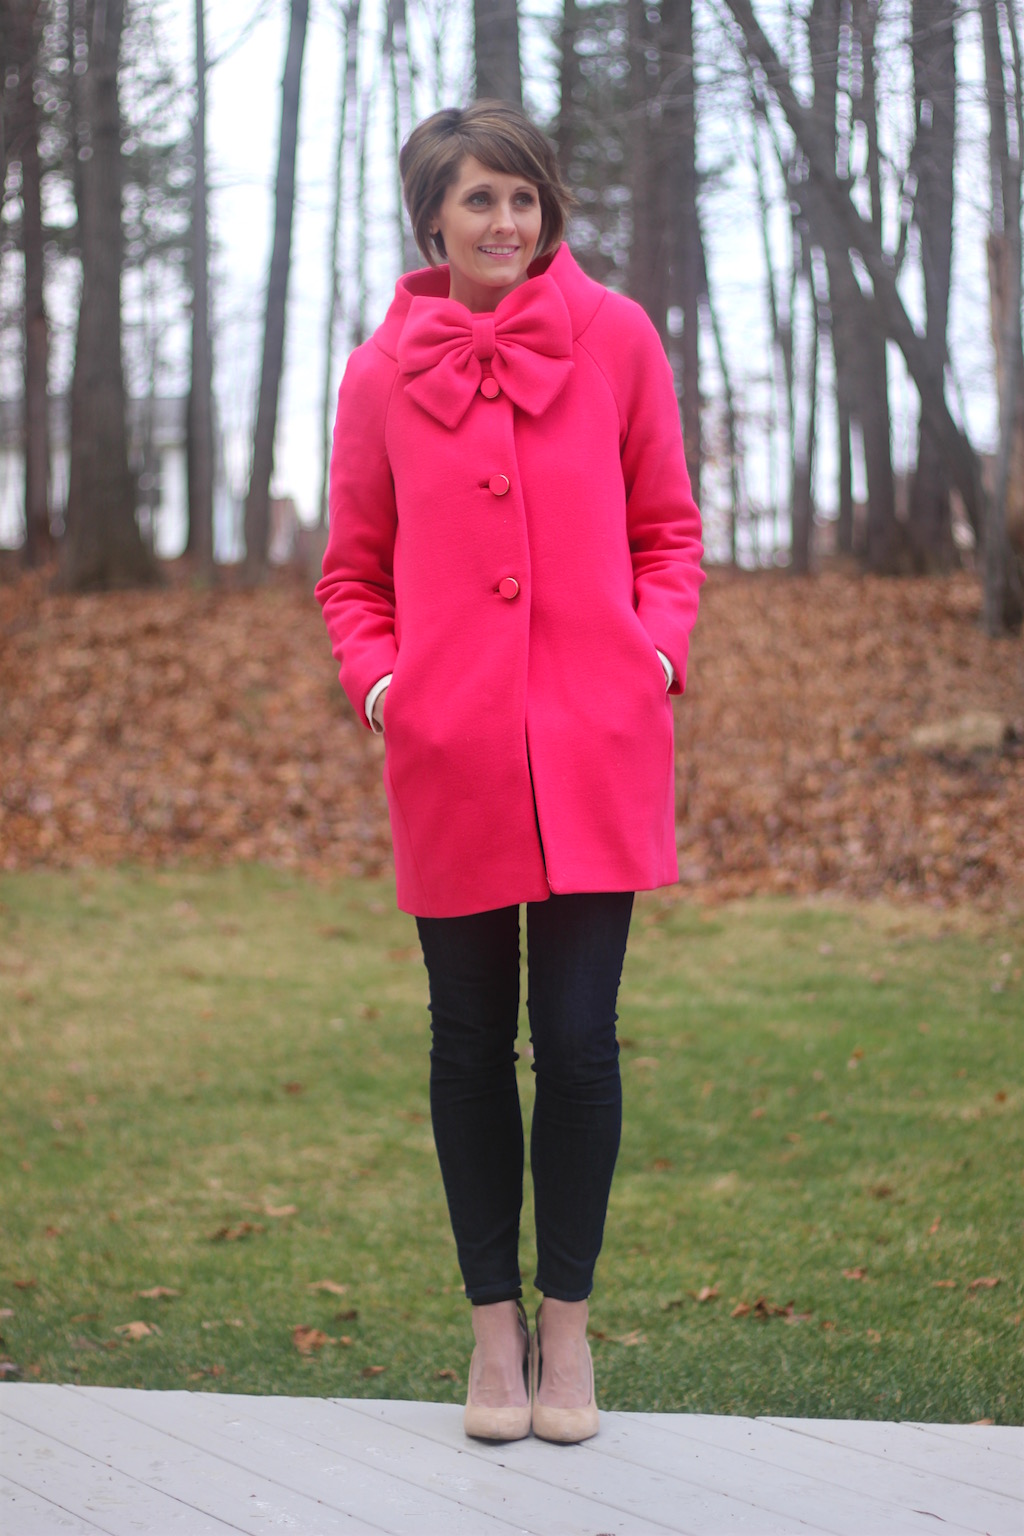 bowcoat4